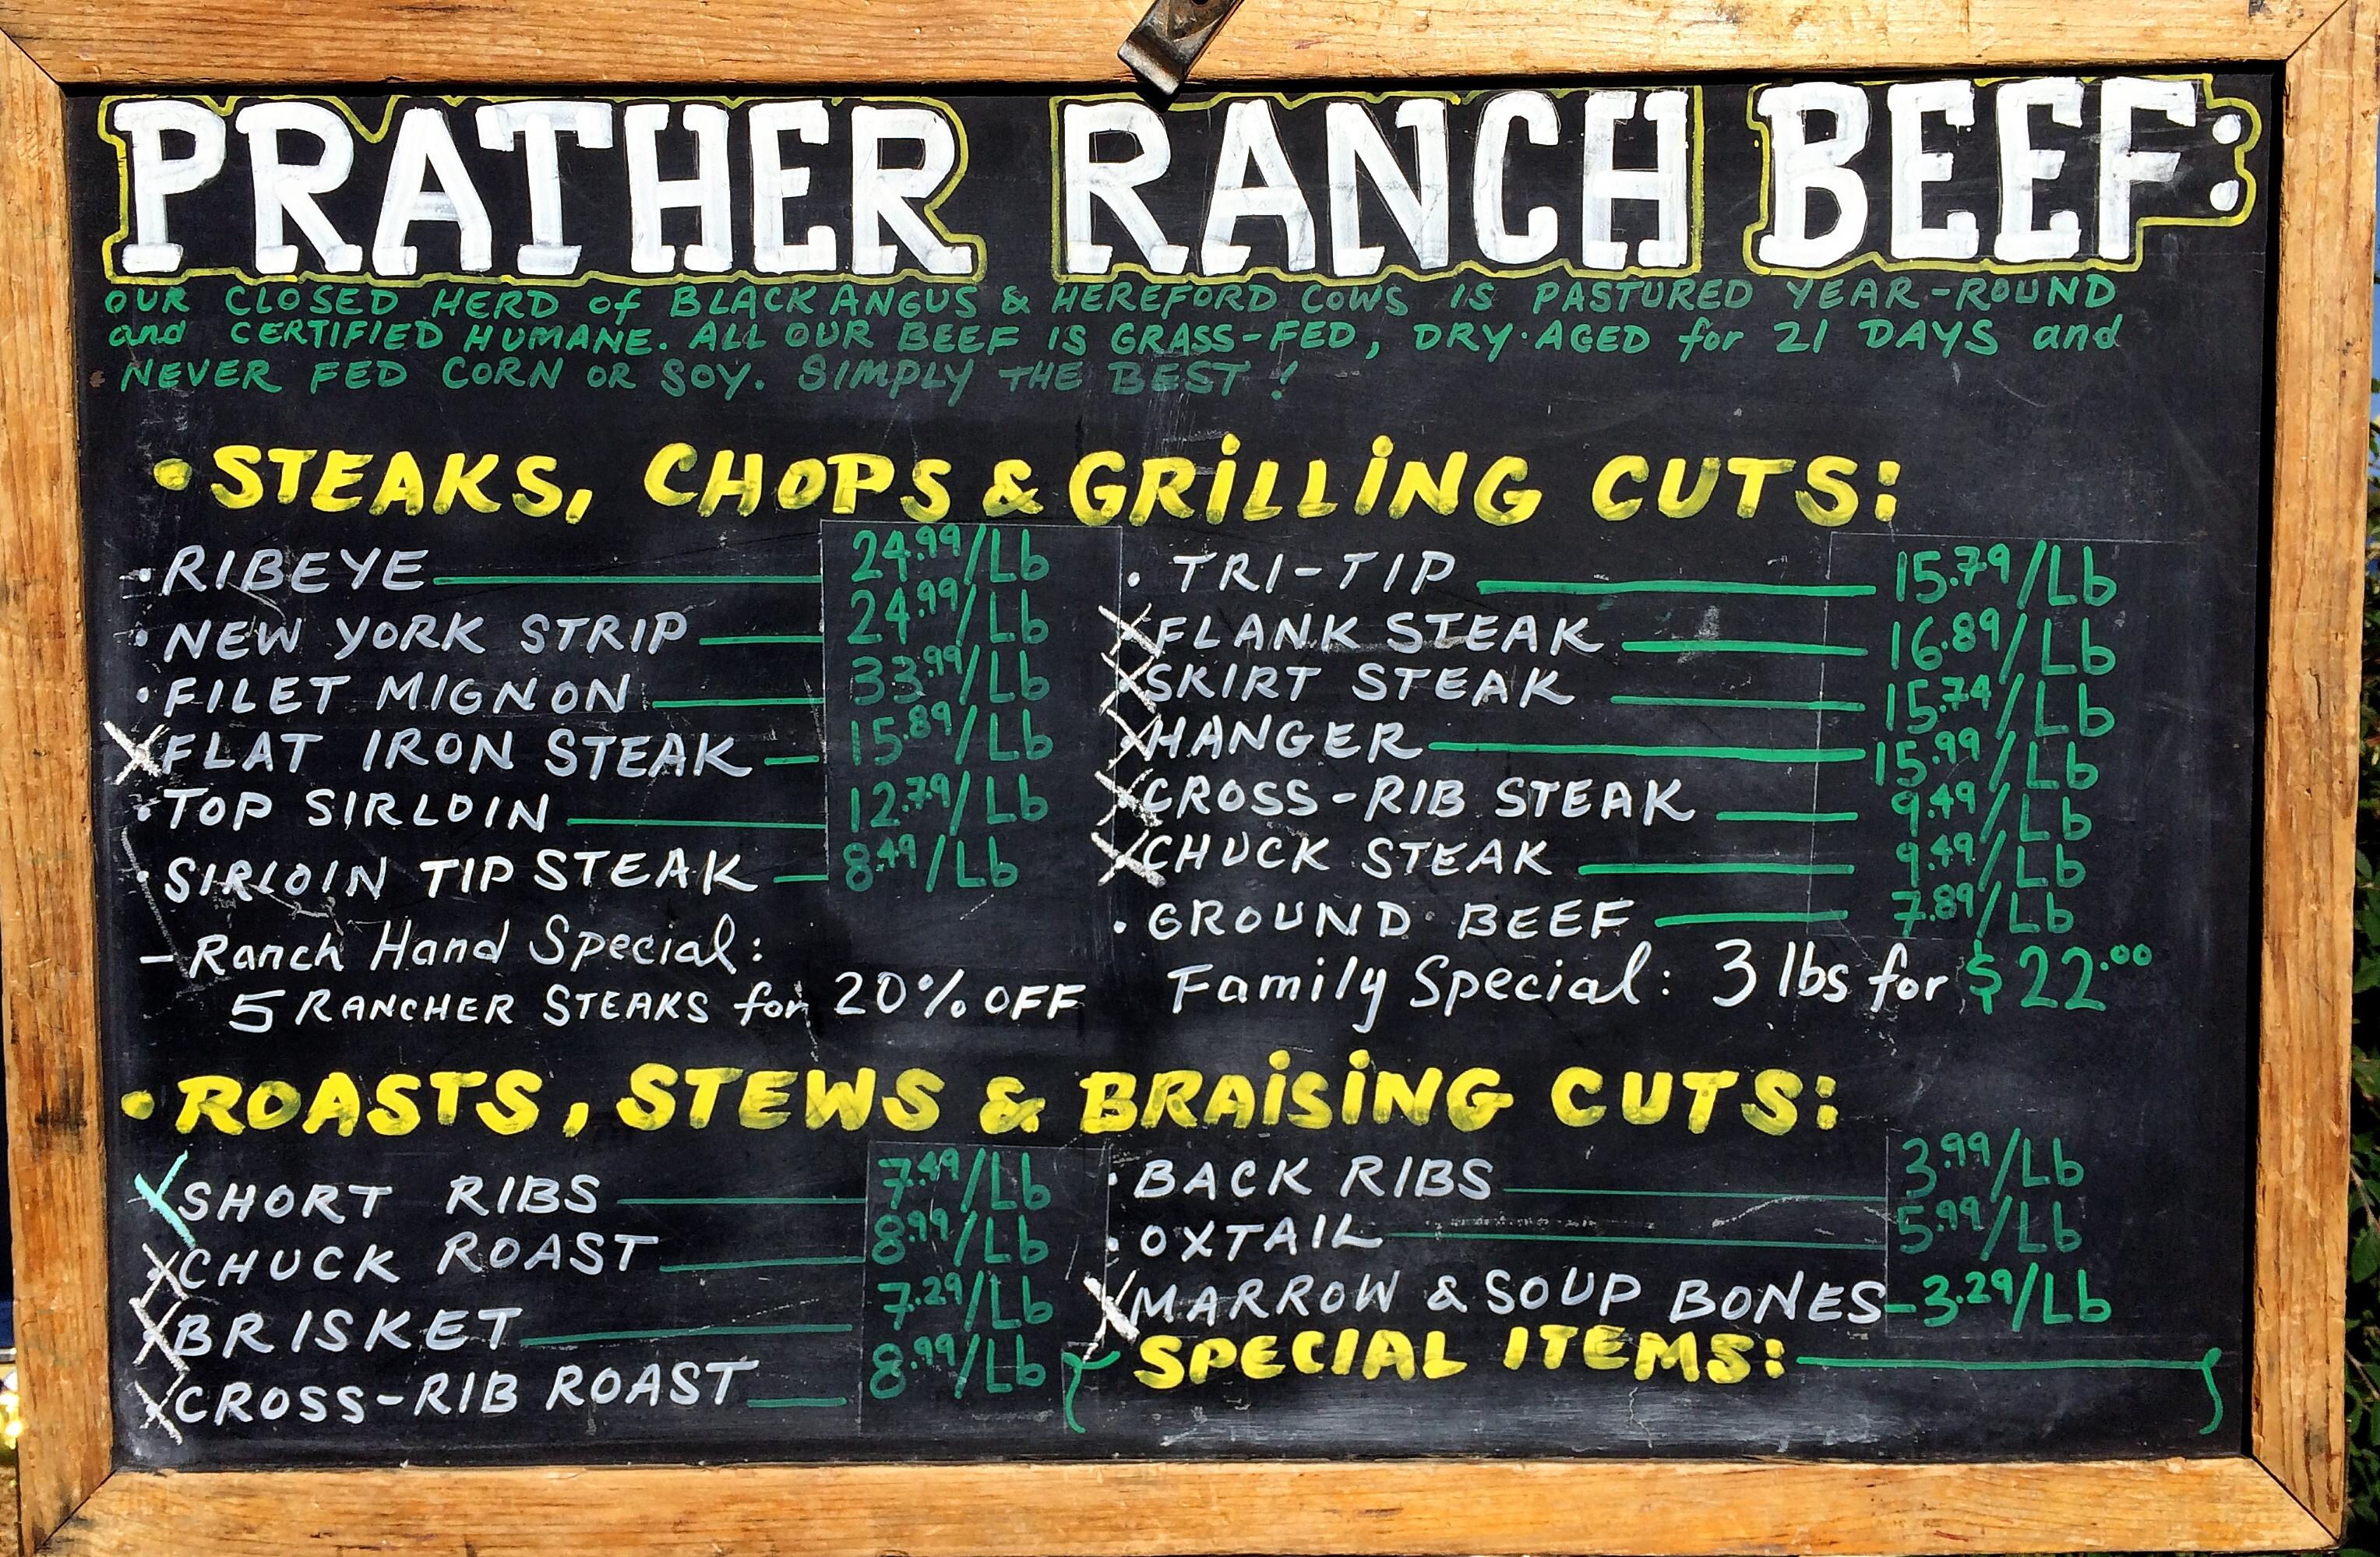 Prather Ranch Beef